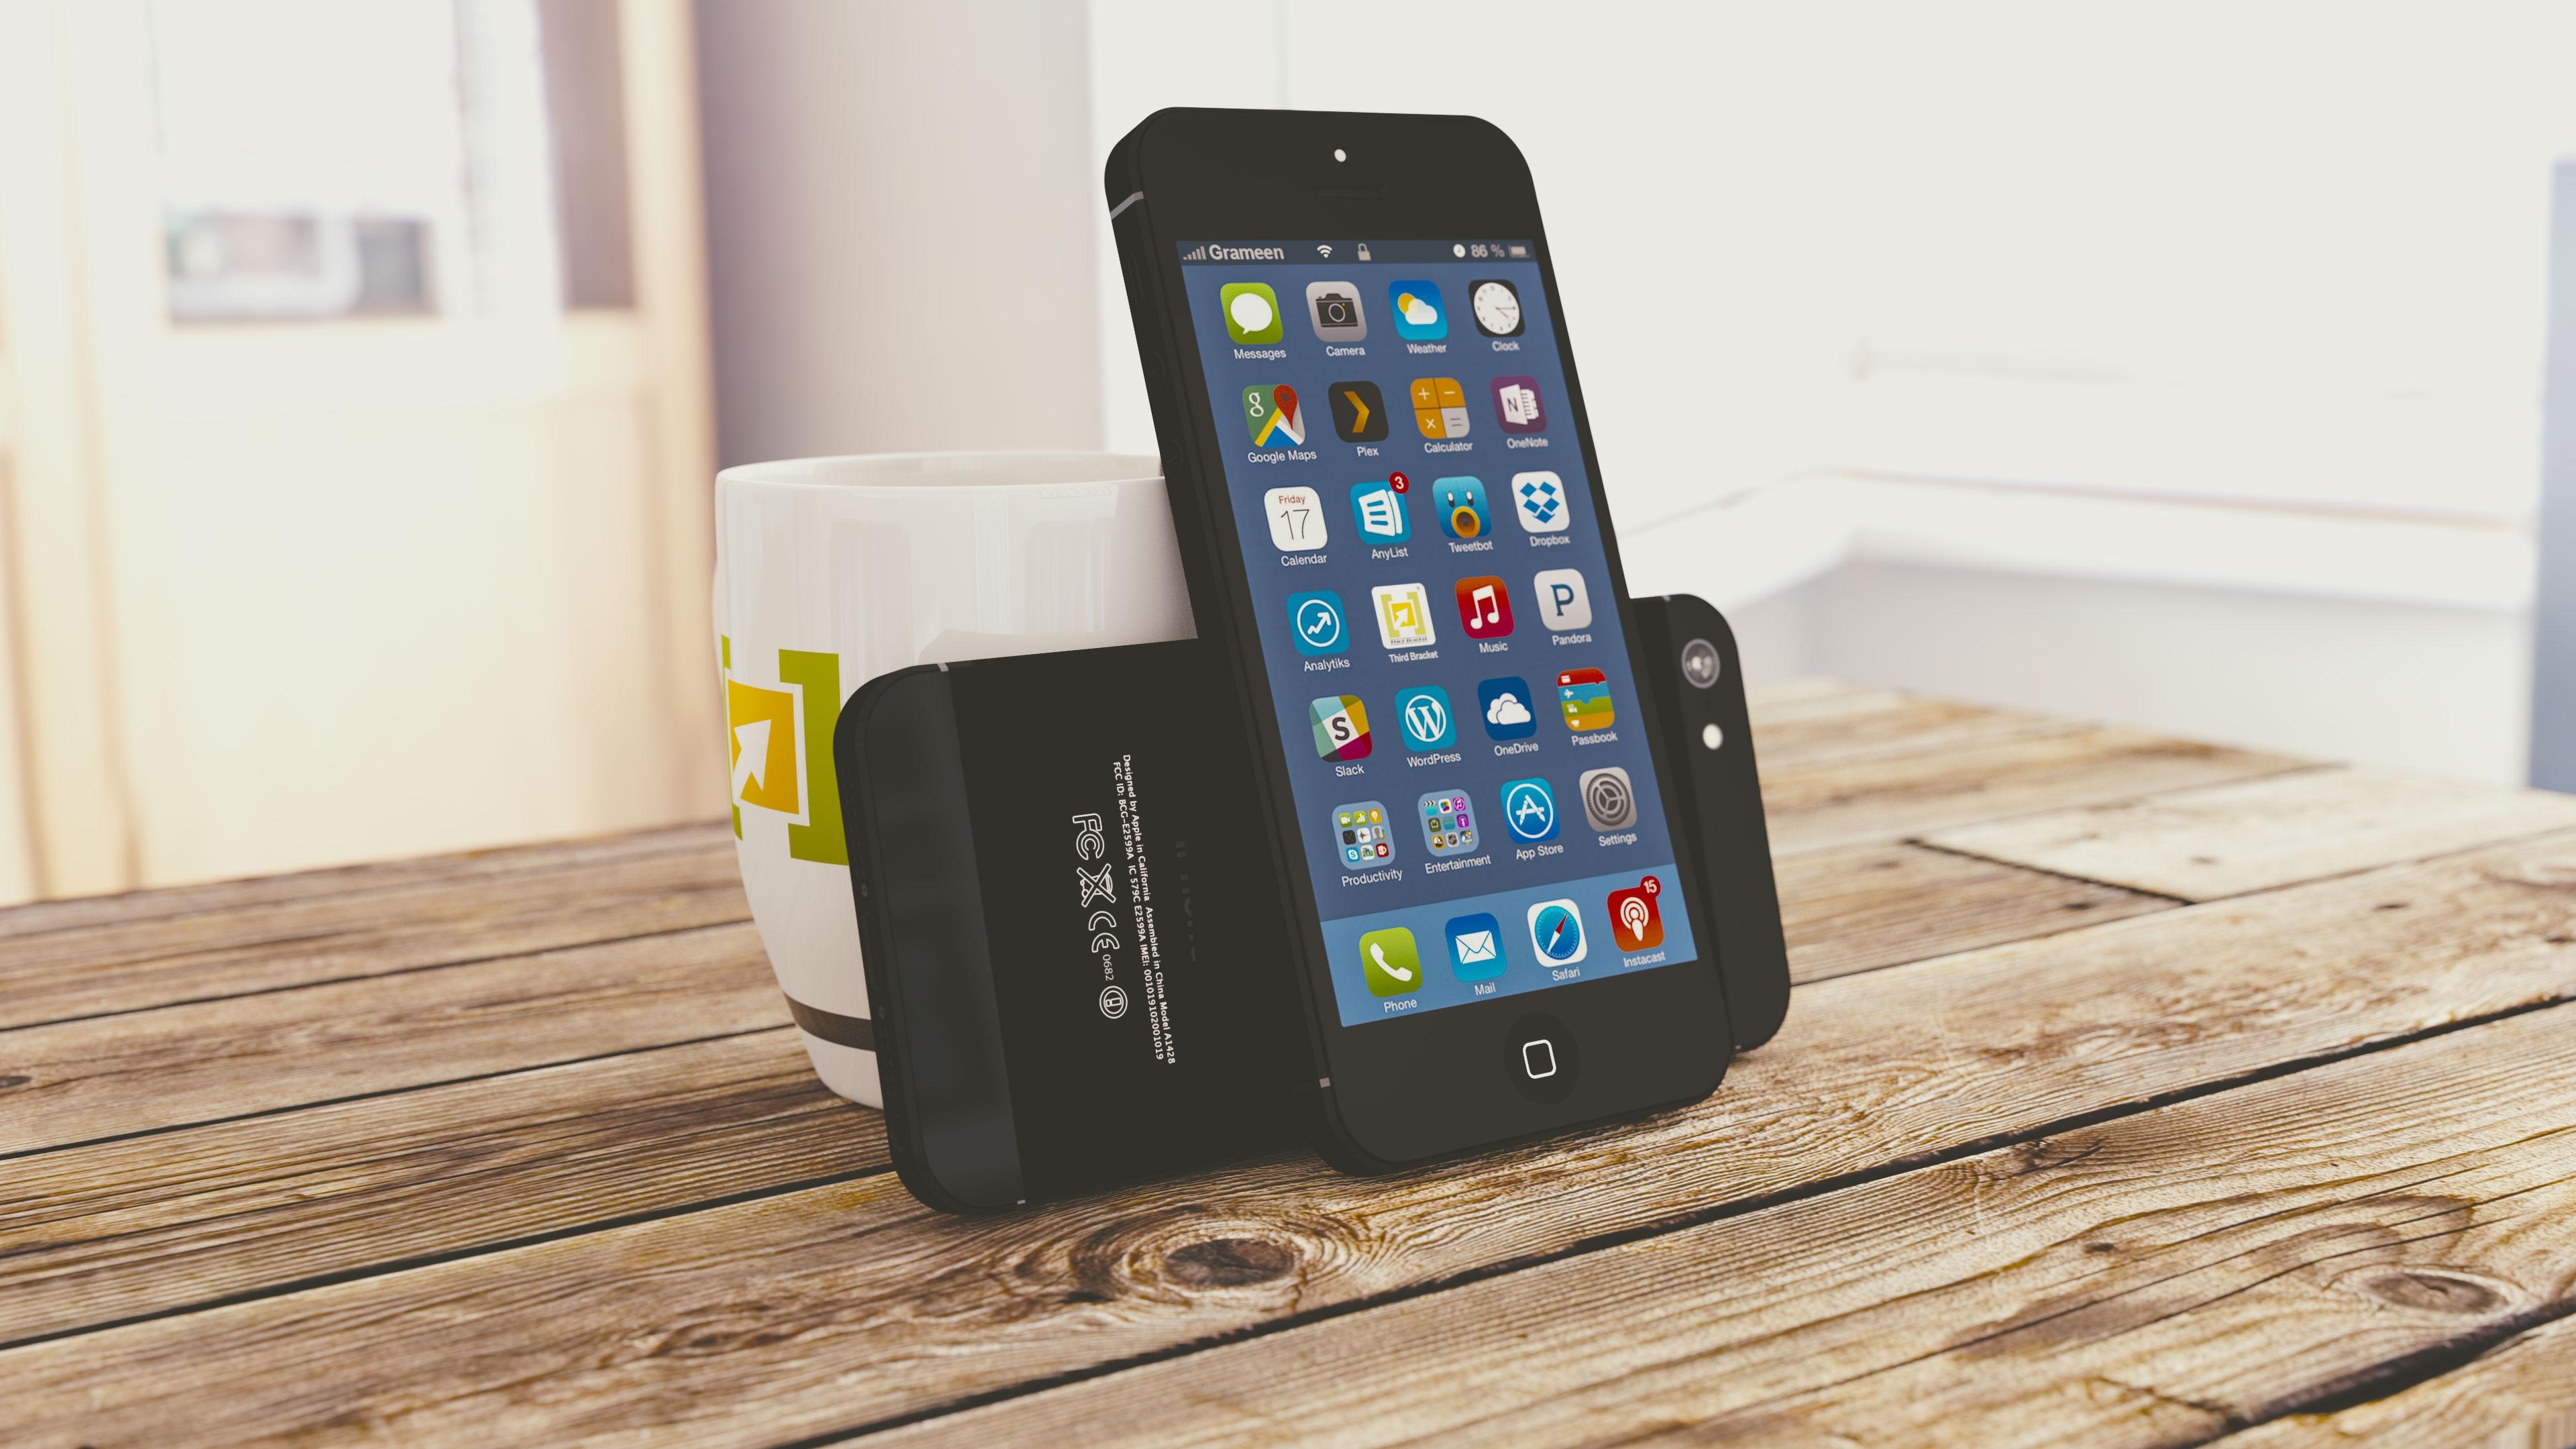 I Phone, Apple, Electronic, Ios, Iphone, HQ Photo